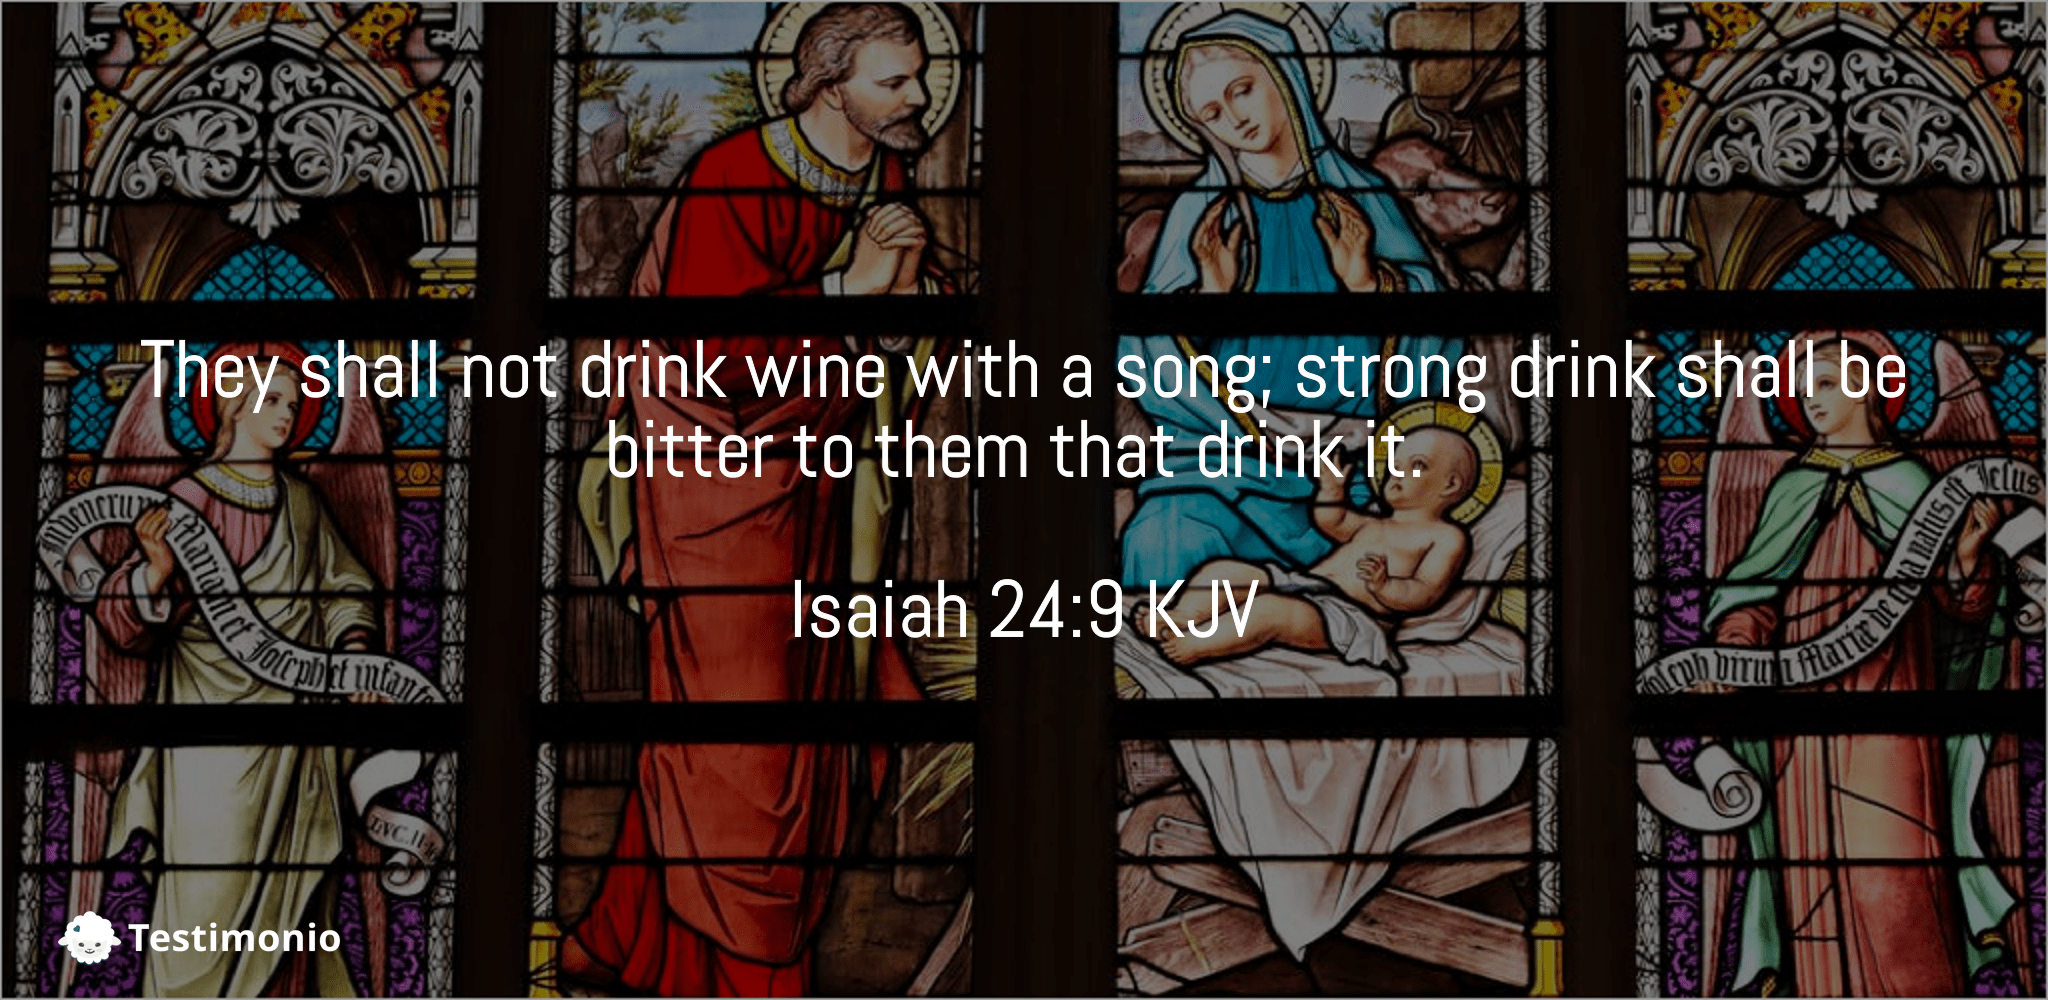 Isaiah 24:9